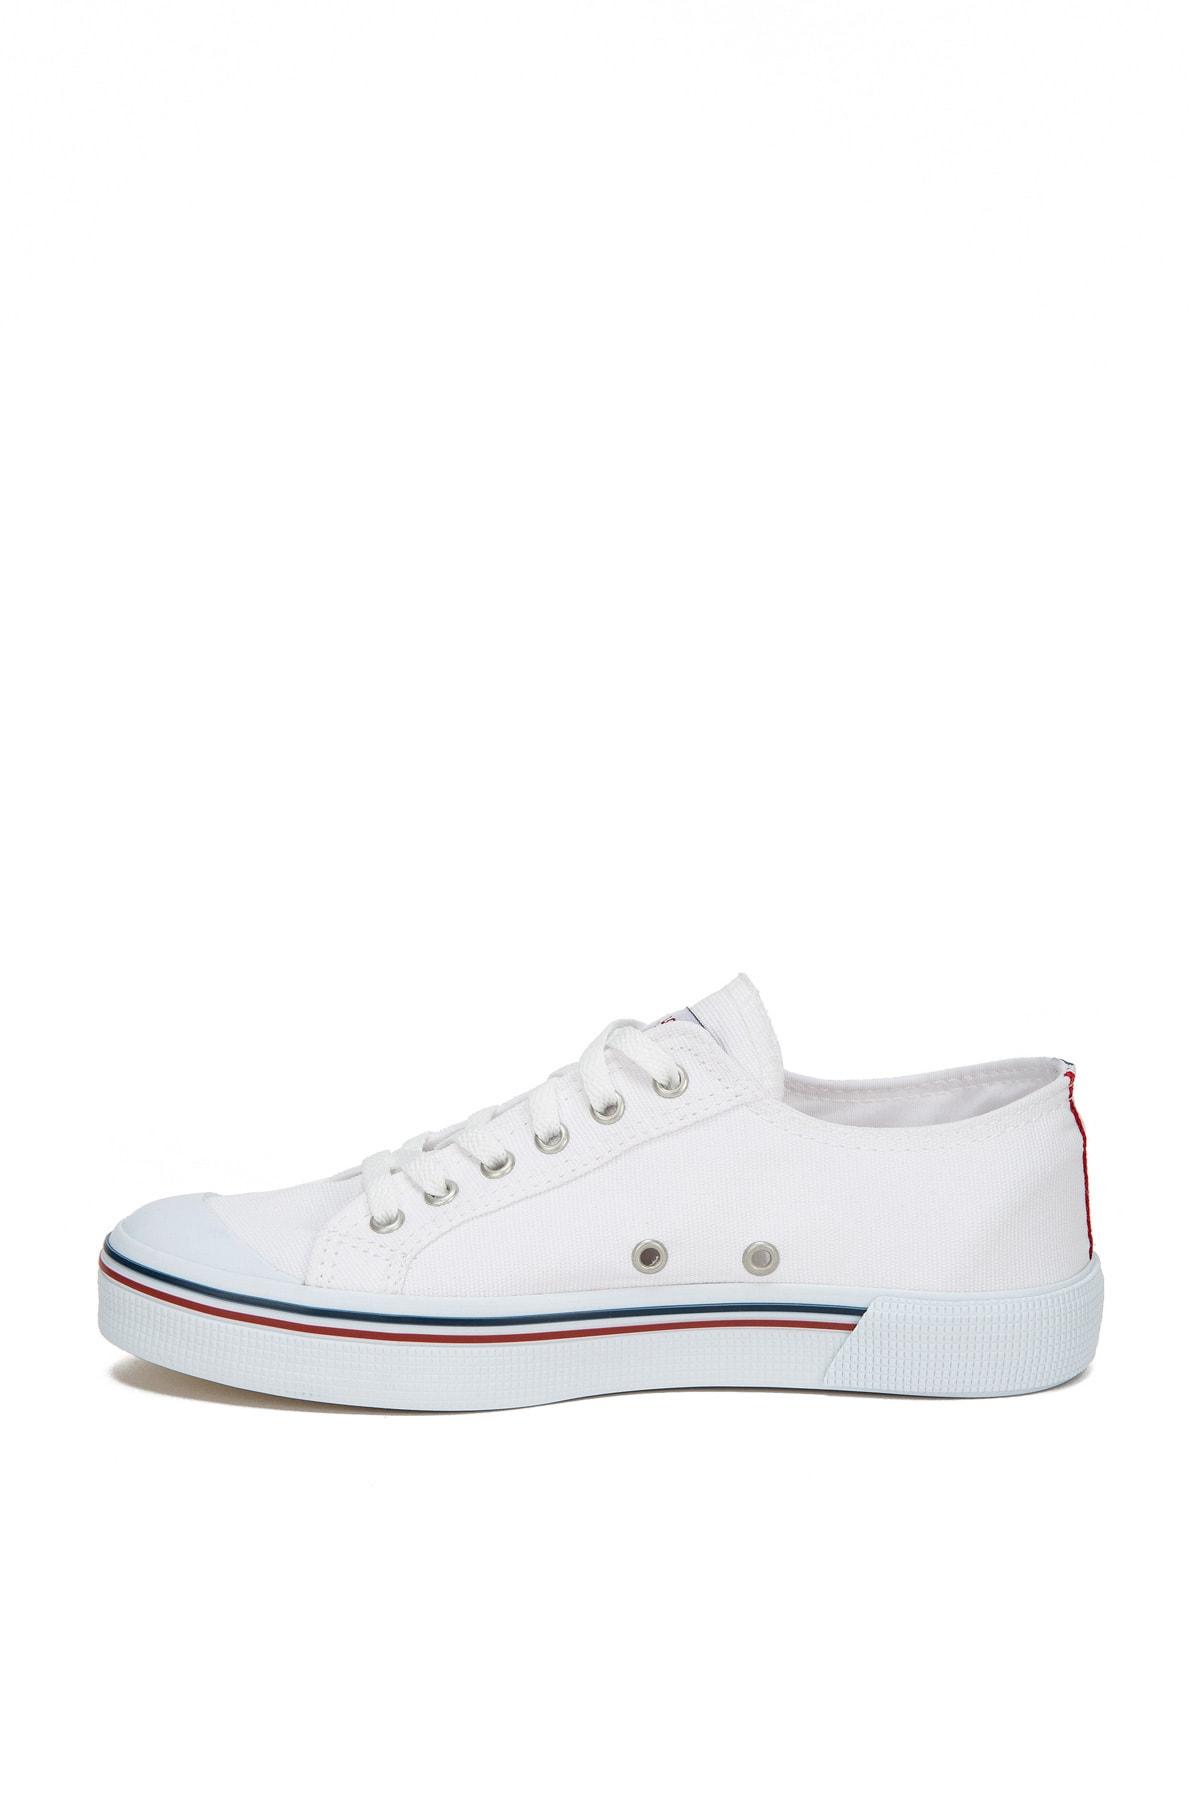 U.S. Polo Assn. Erkek Sneaker S081SZ033.000.1027729 2